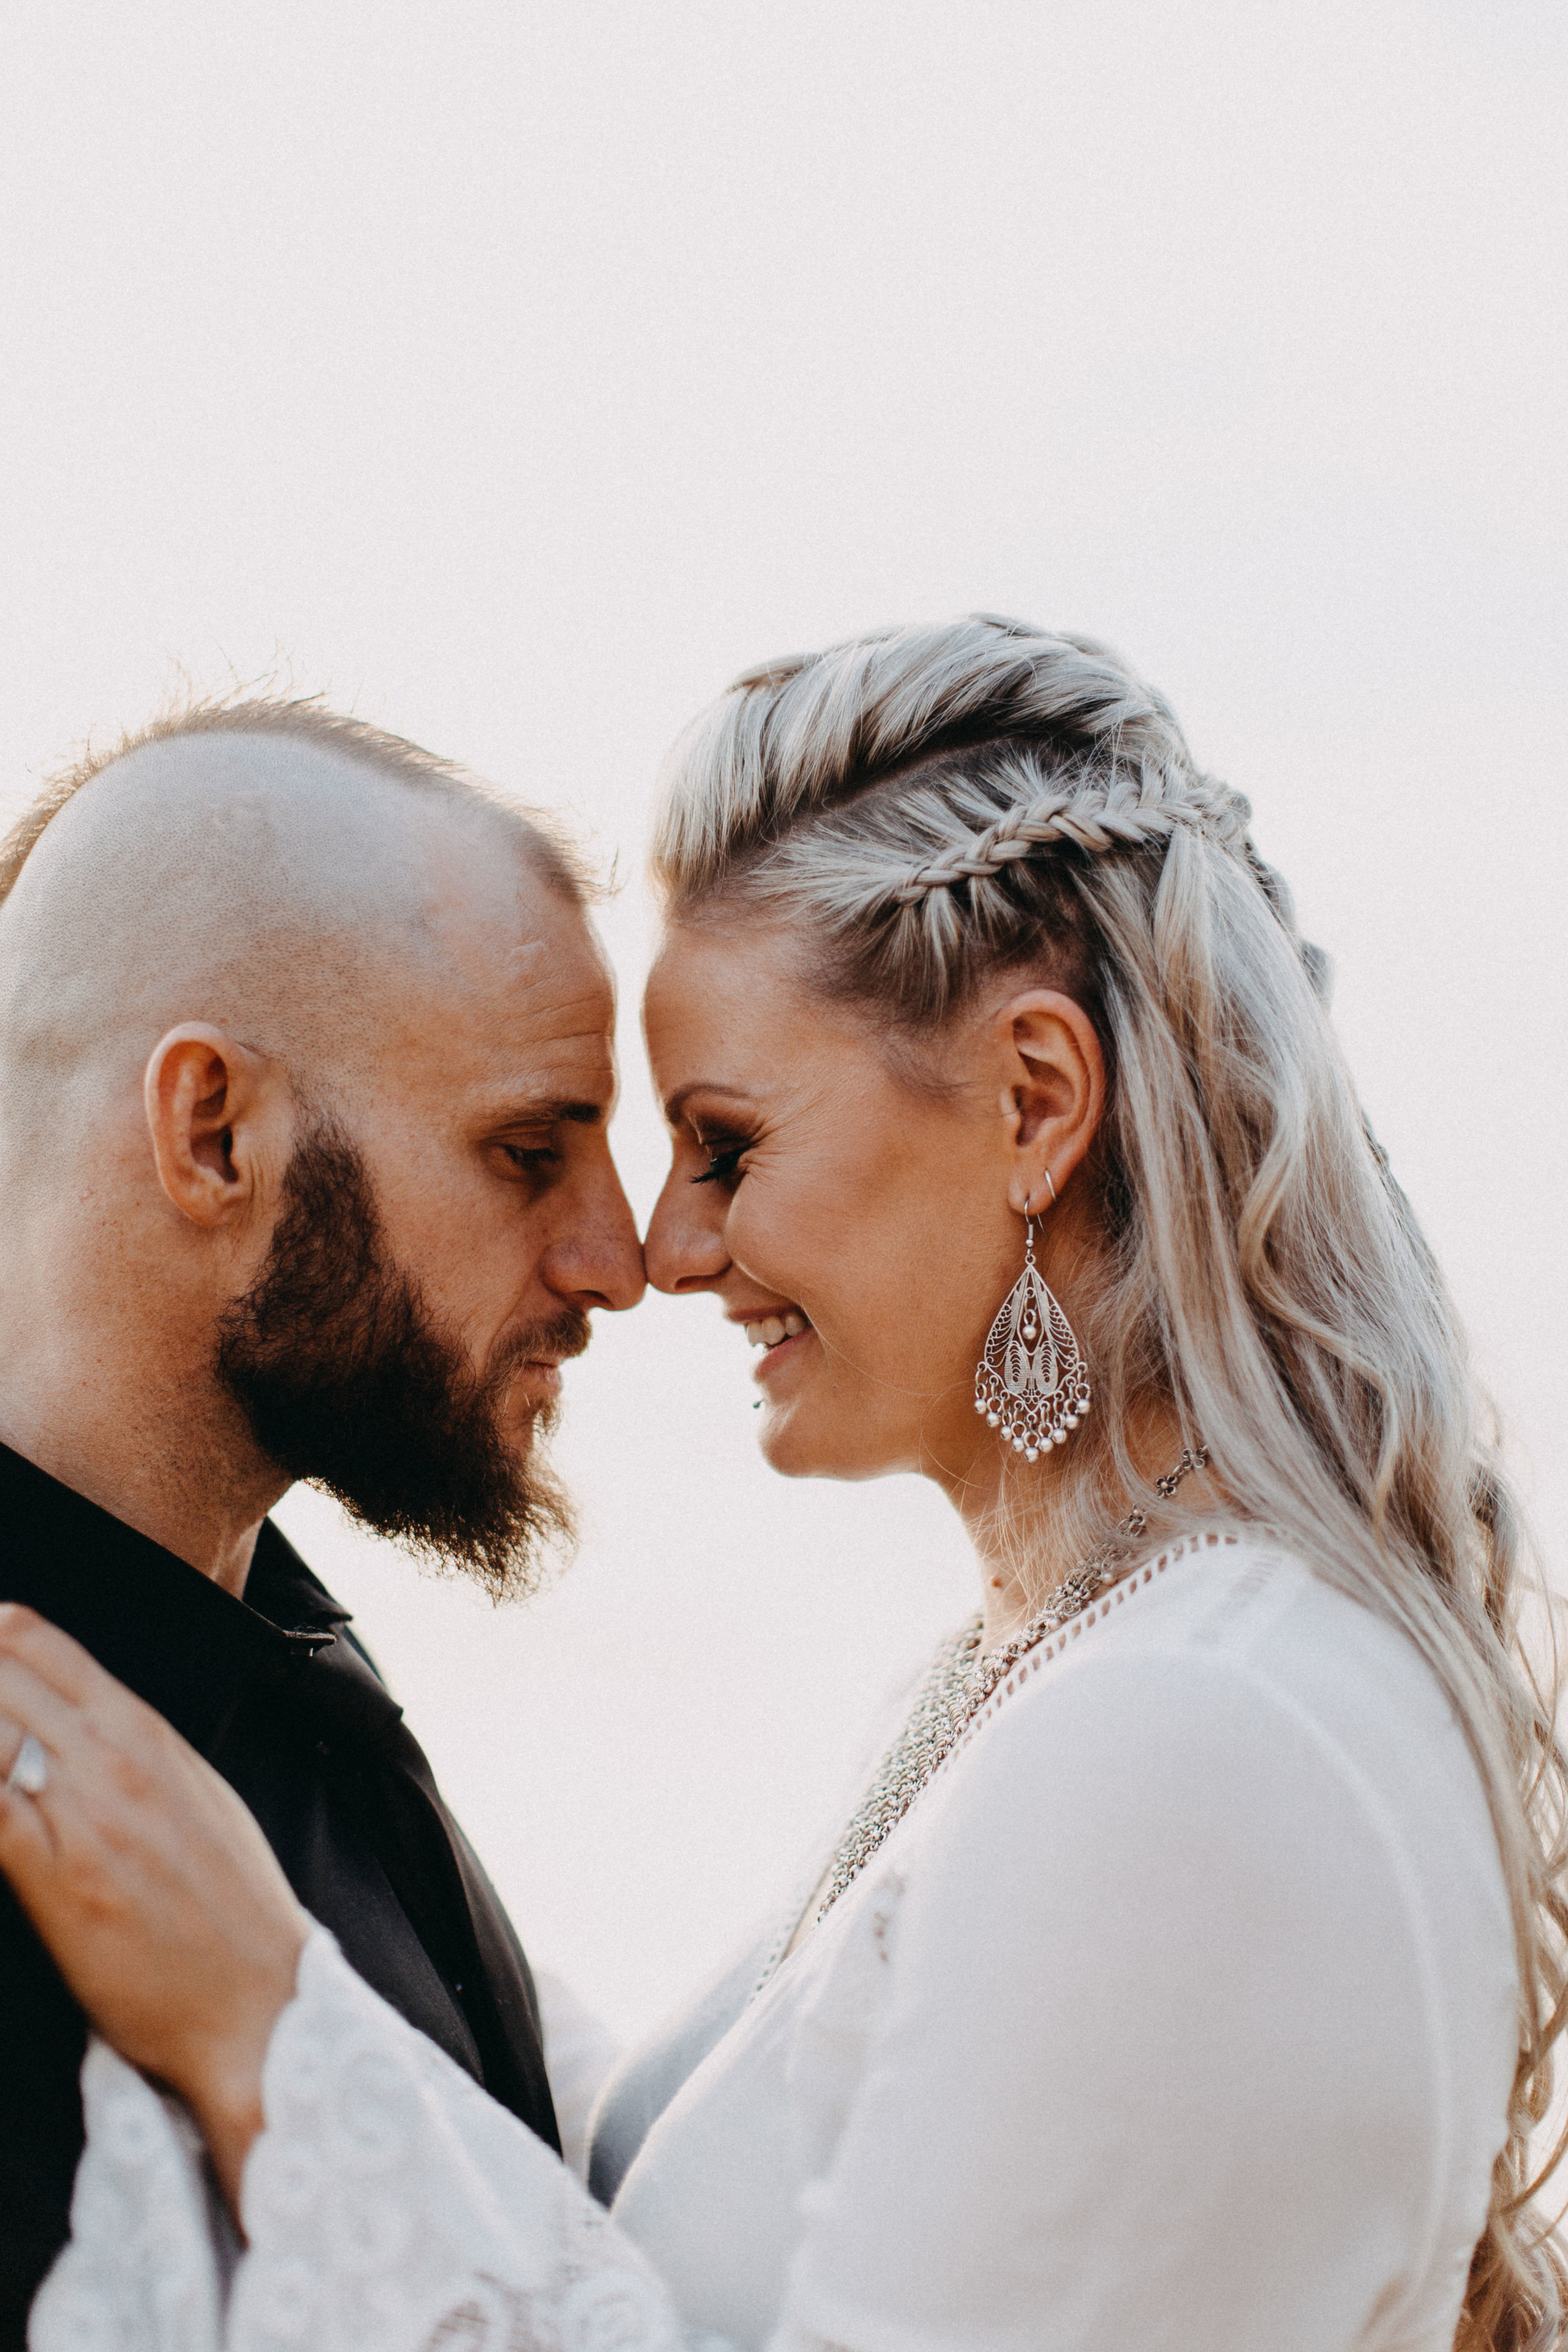 darwin-elopement-wedding-beach-camden-photography-www.emilyobrienphotography.net-87.jpg